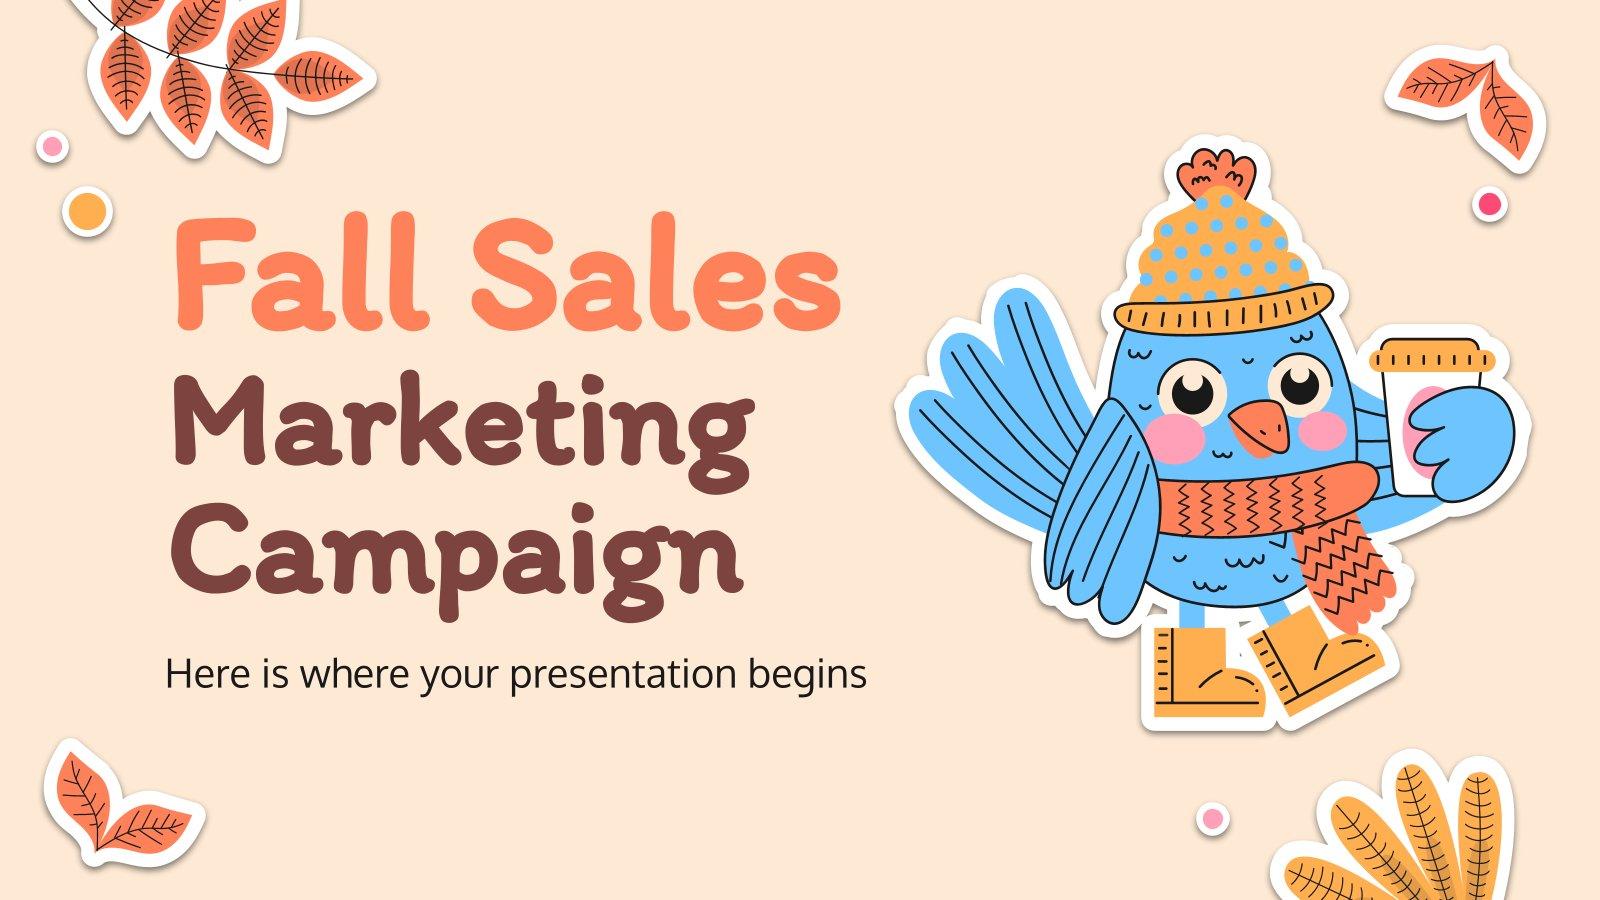 Fall Sales MK Campaign presentation template